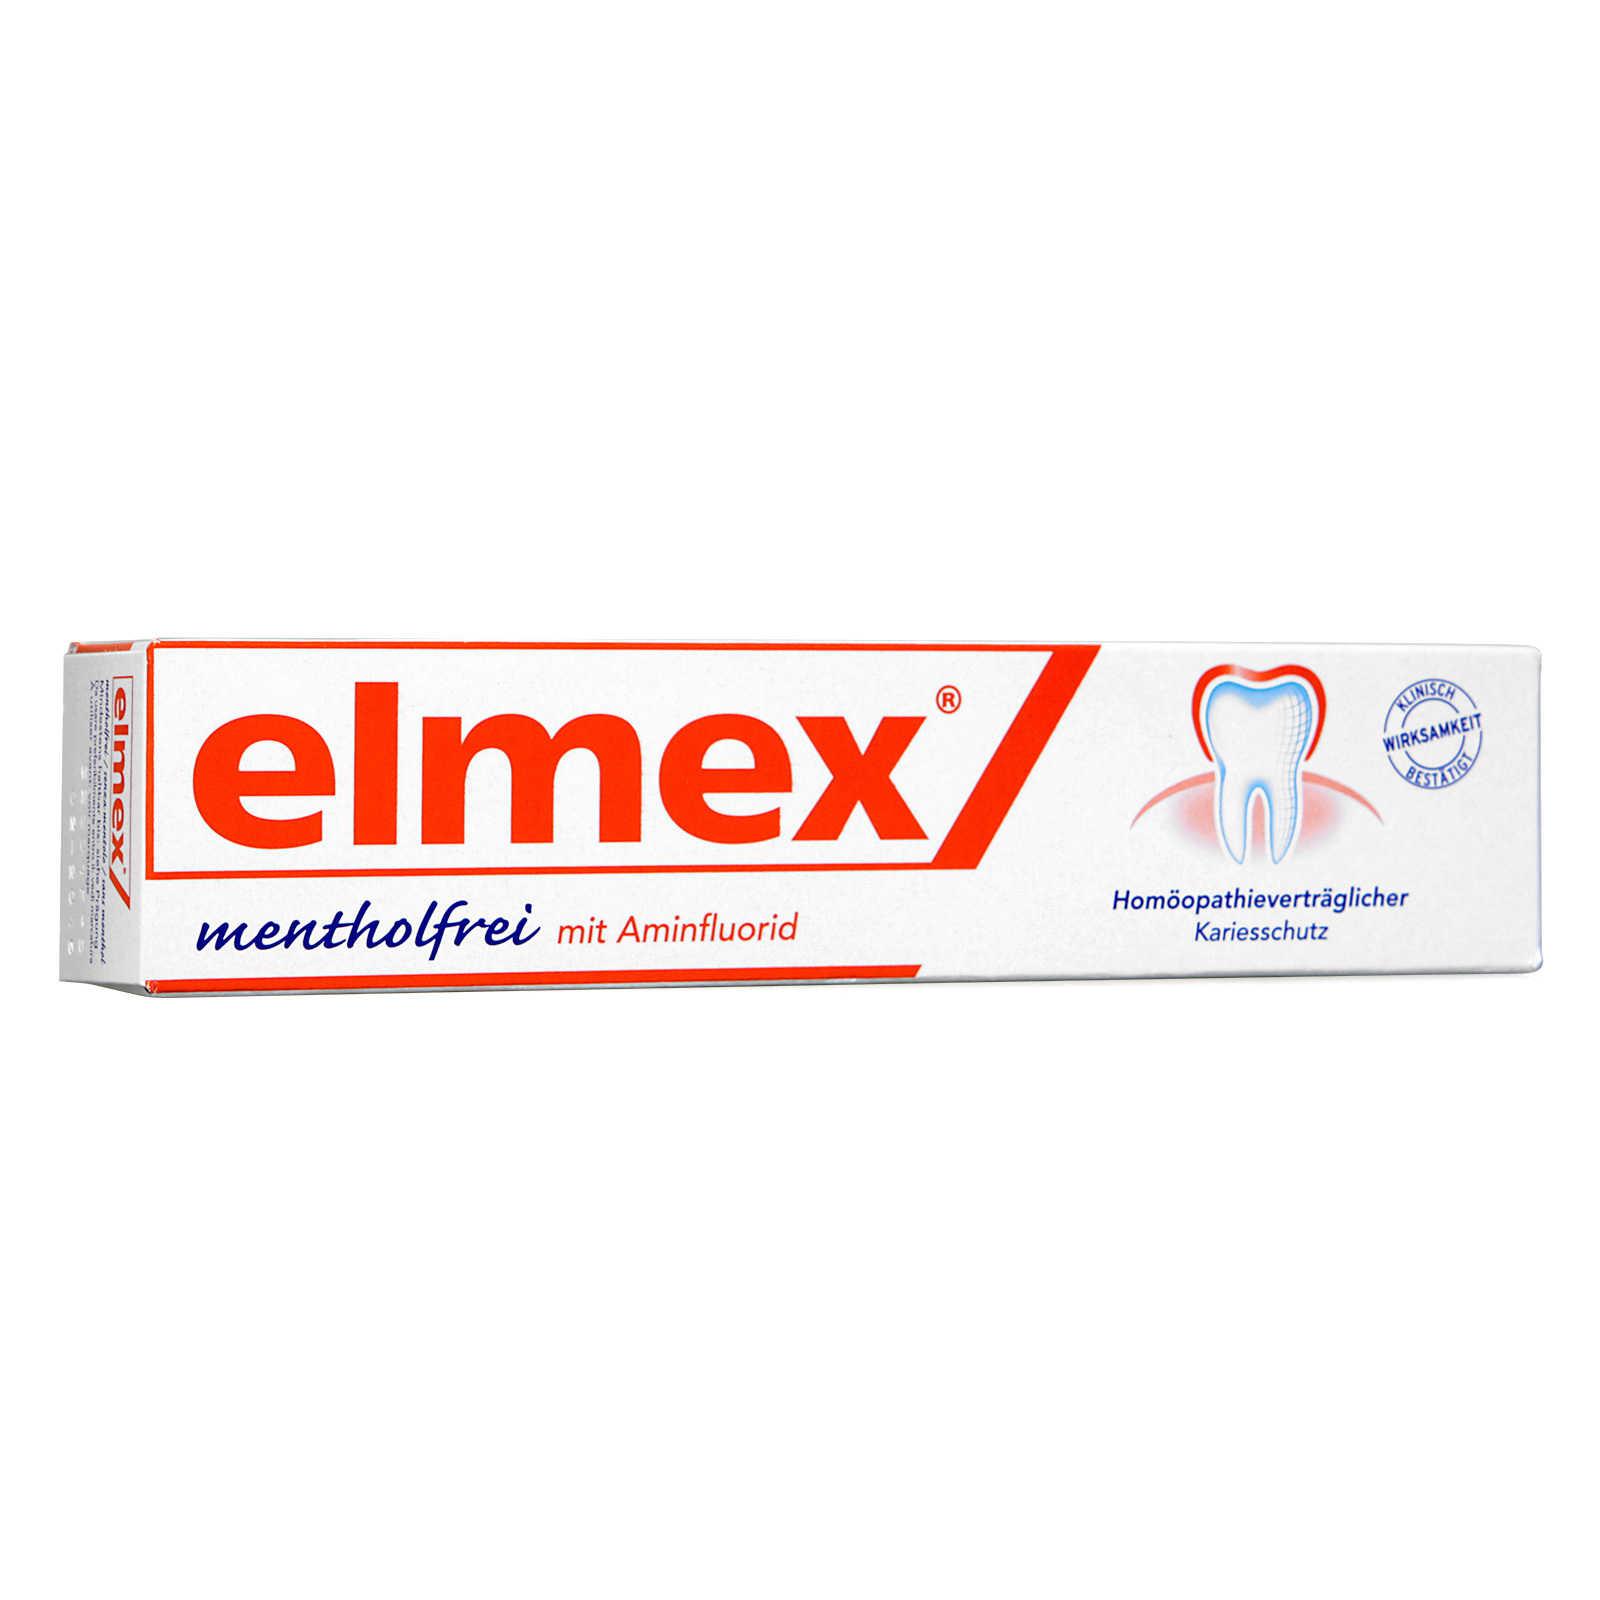 Mentolo - Elmex - Dentifricio Senza Mentolo